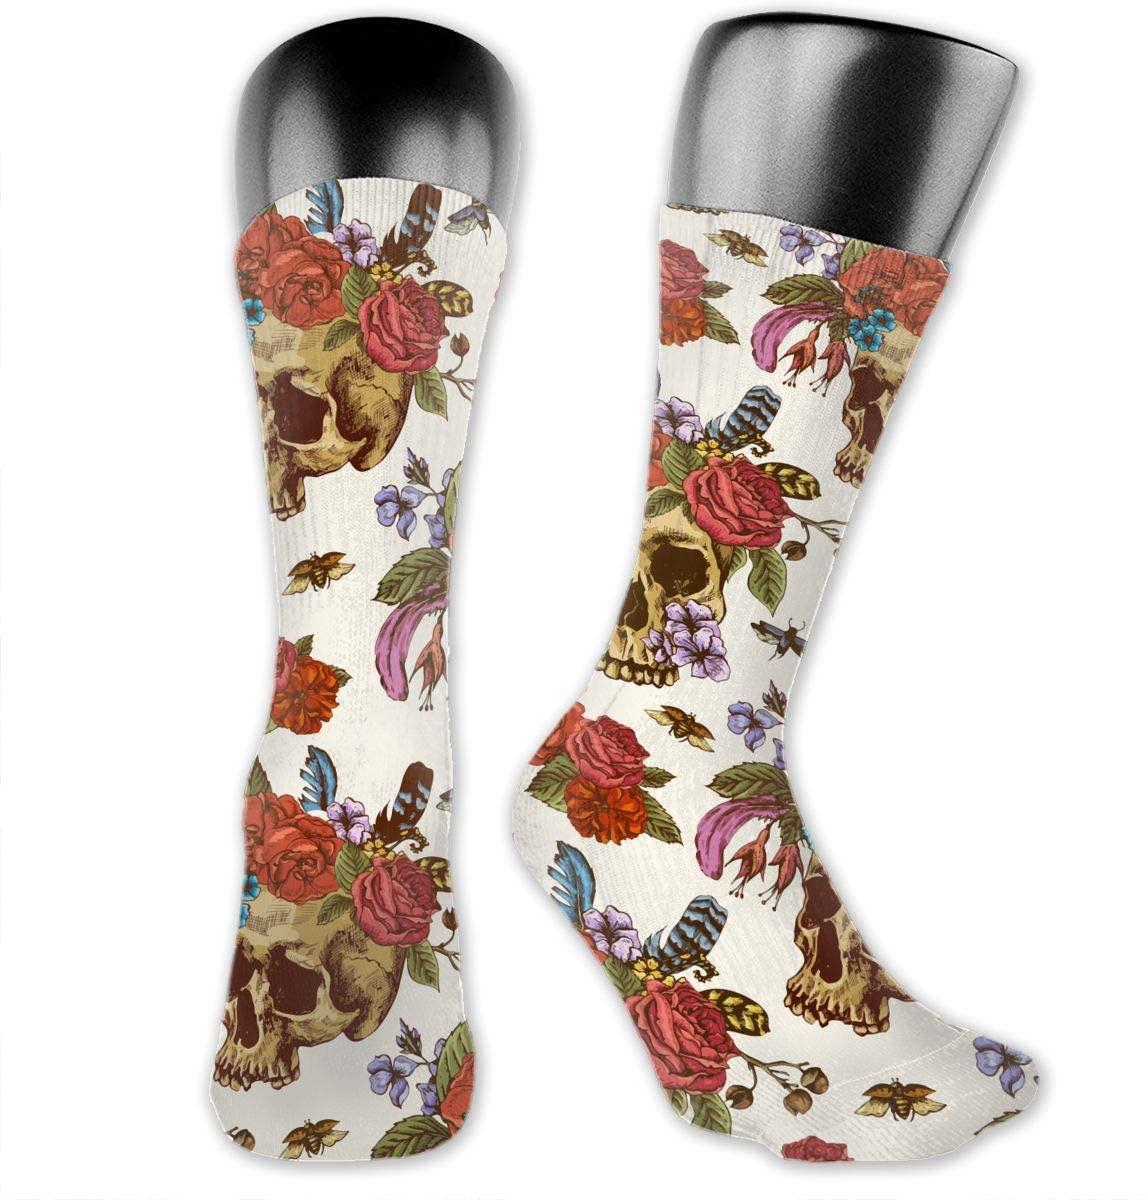 Skull Flowers Head Unisex Outdoor Long Socks Sport Athletic Crew Socks Stockings